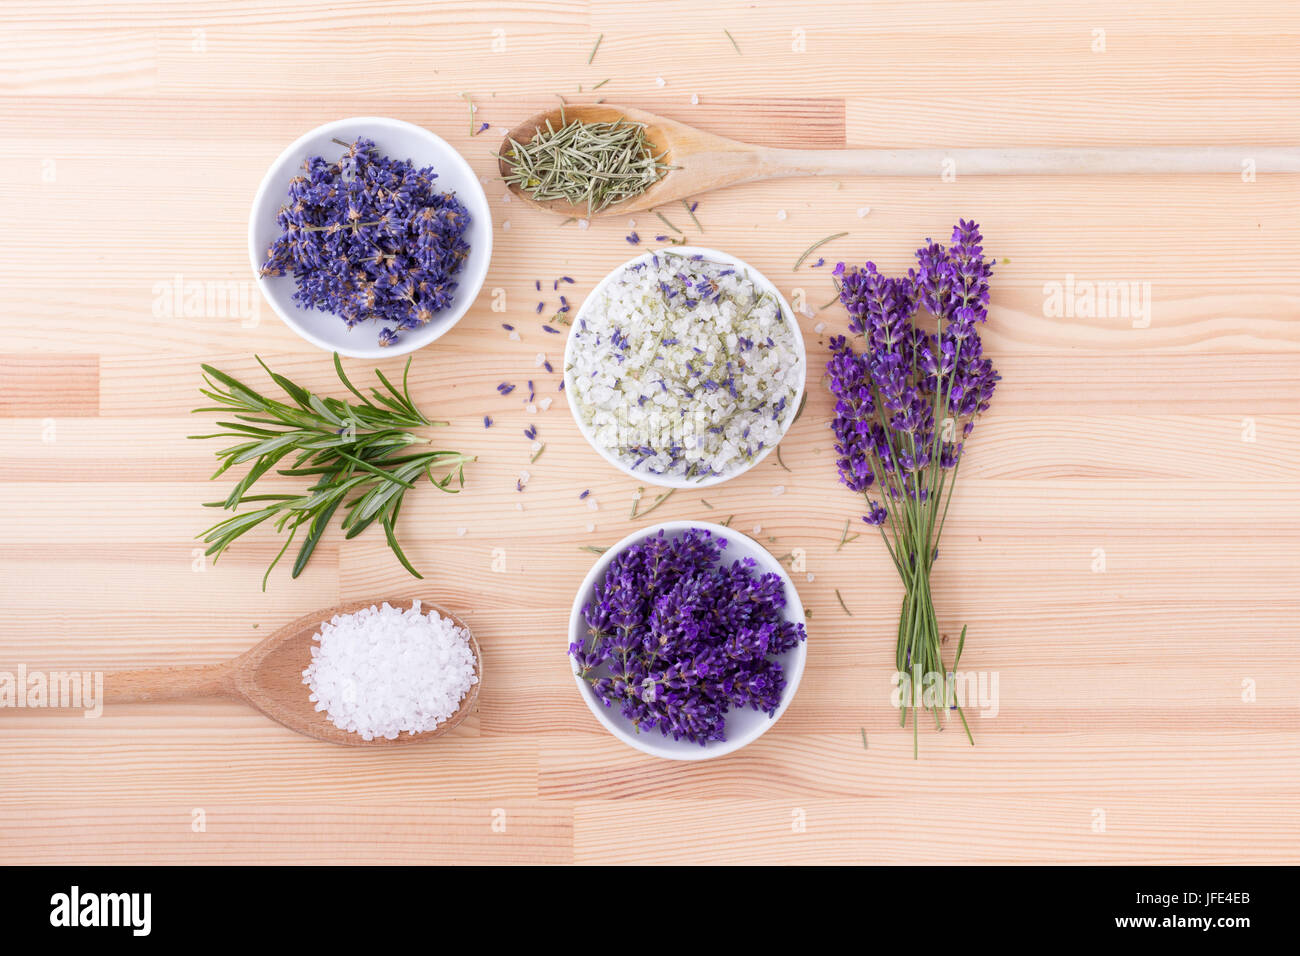 Kräutersalz von Rosmarin und Lavendel-Blüten Stockbild